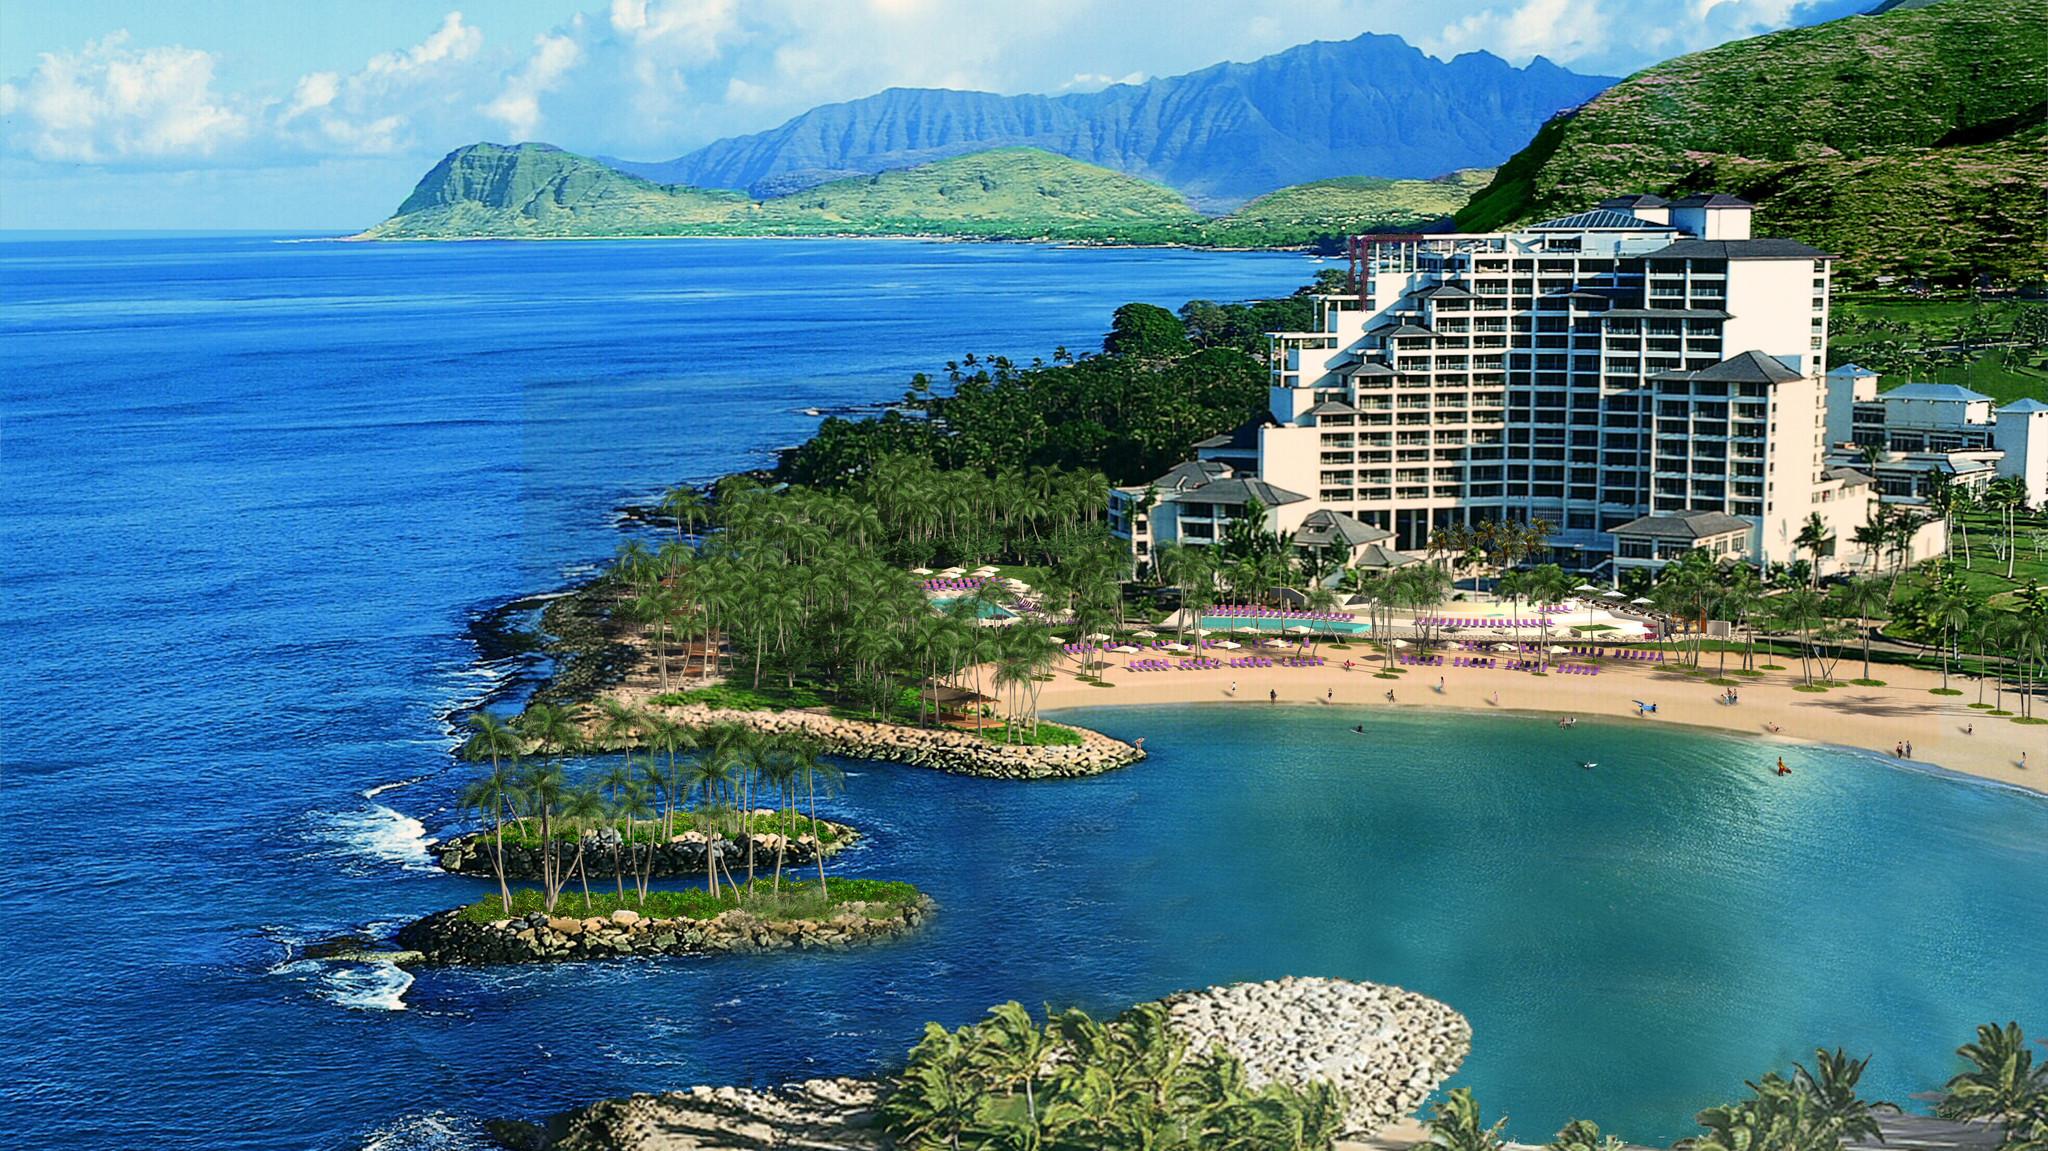 Marriott Near Disney's Oahu Resort To Become A Four